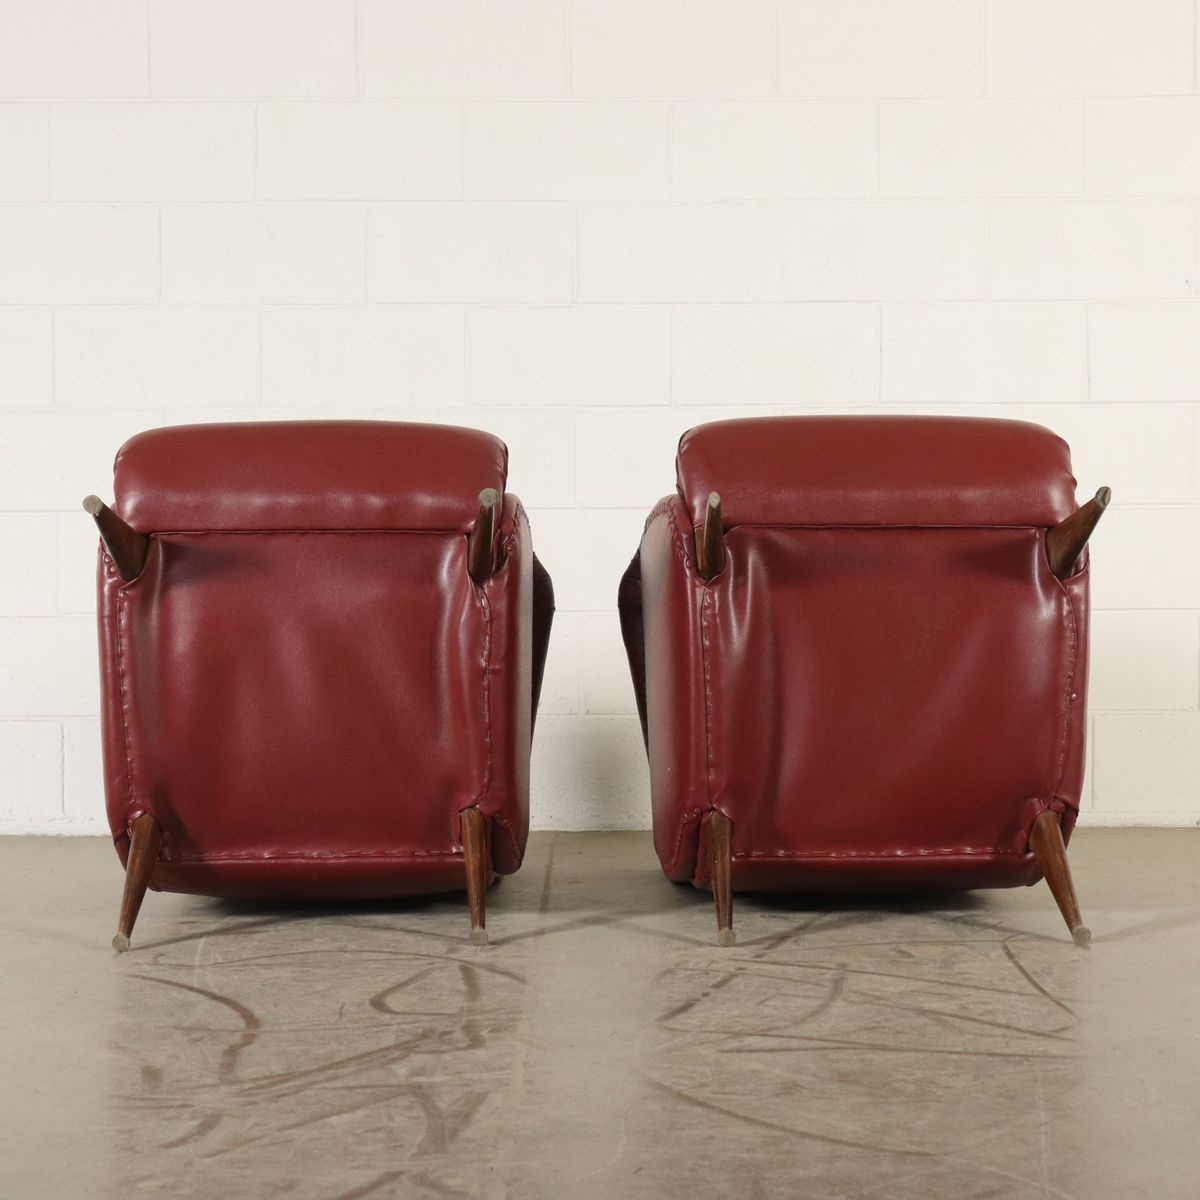 Italienische Sessel Mit Bezug Aus Kunstleder 1950er 2er